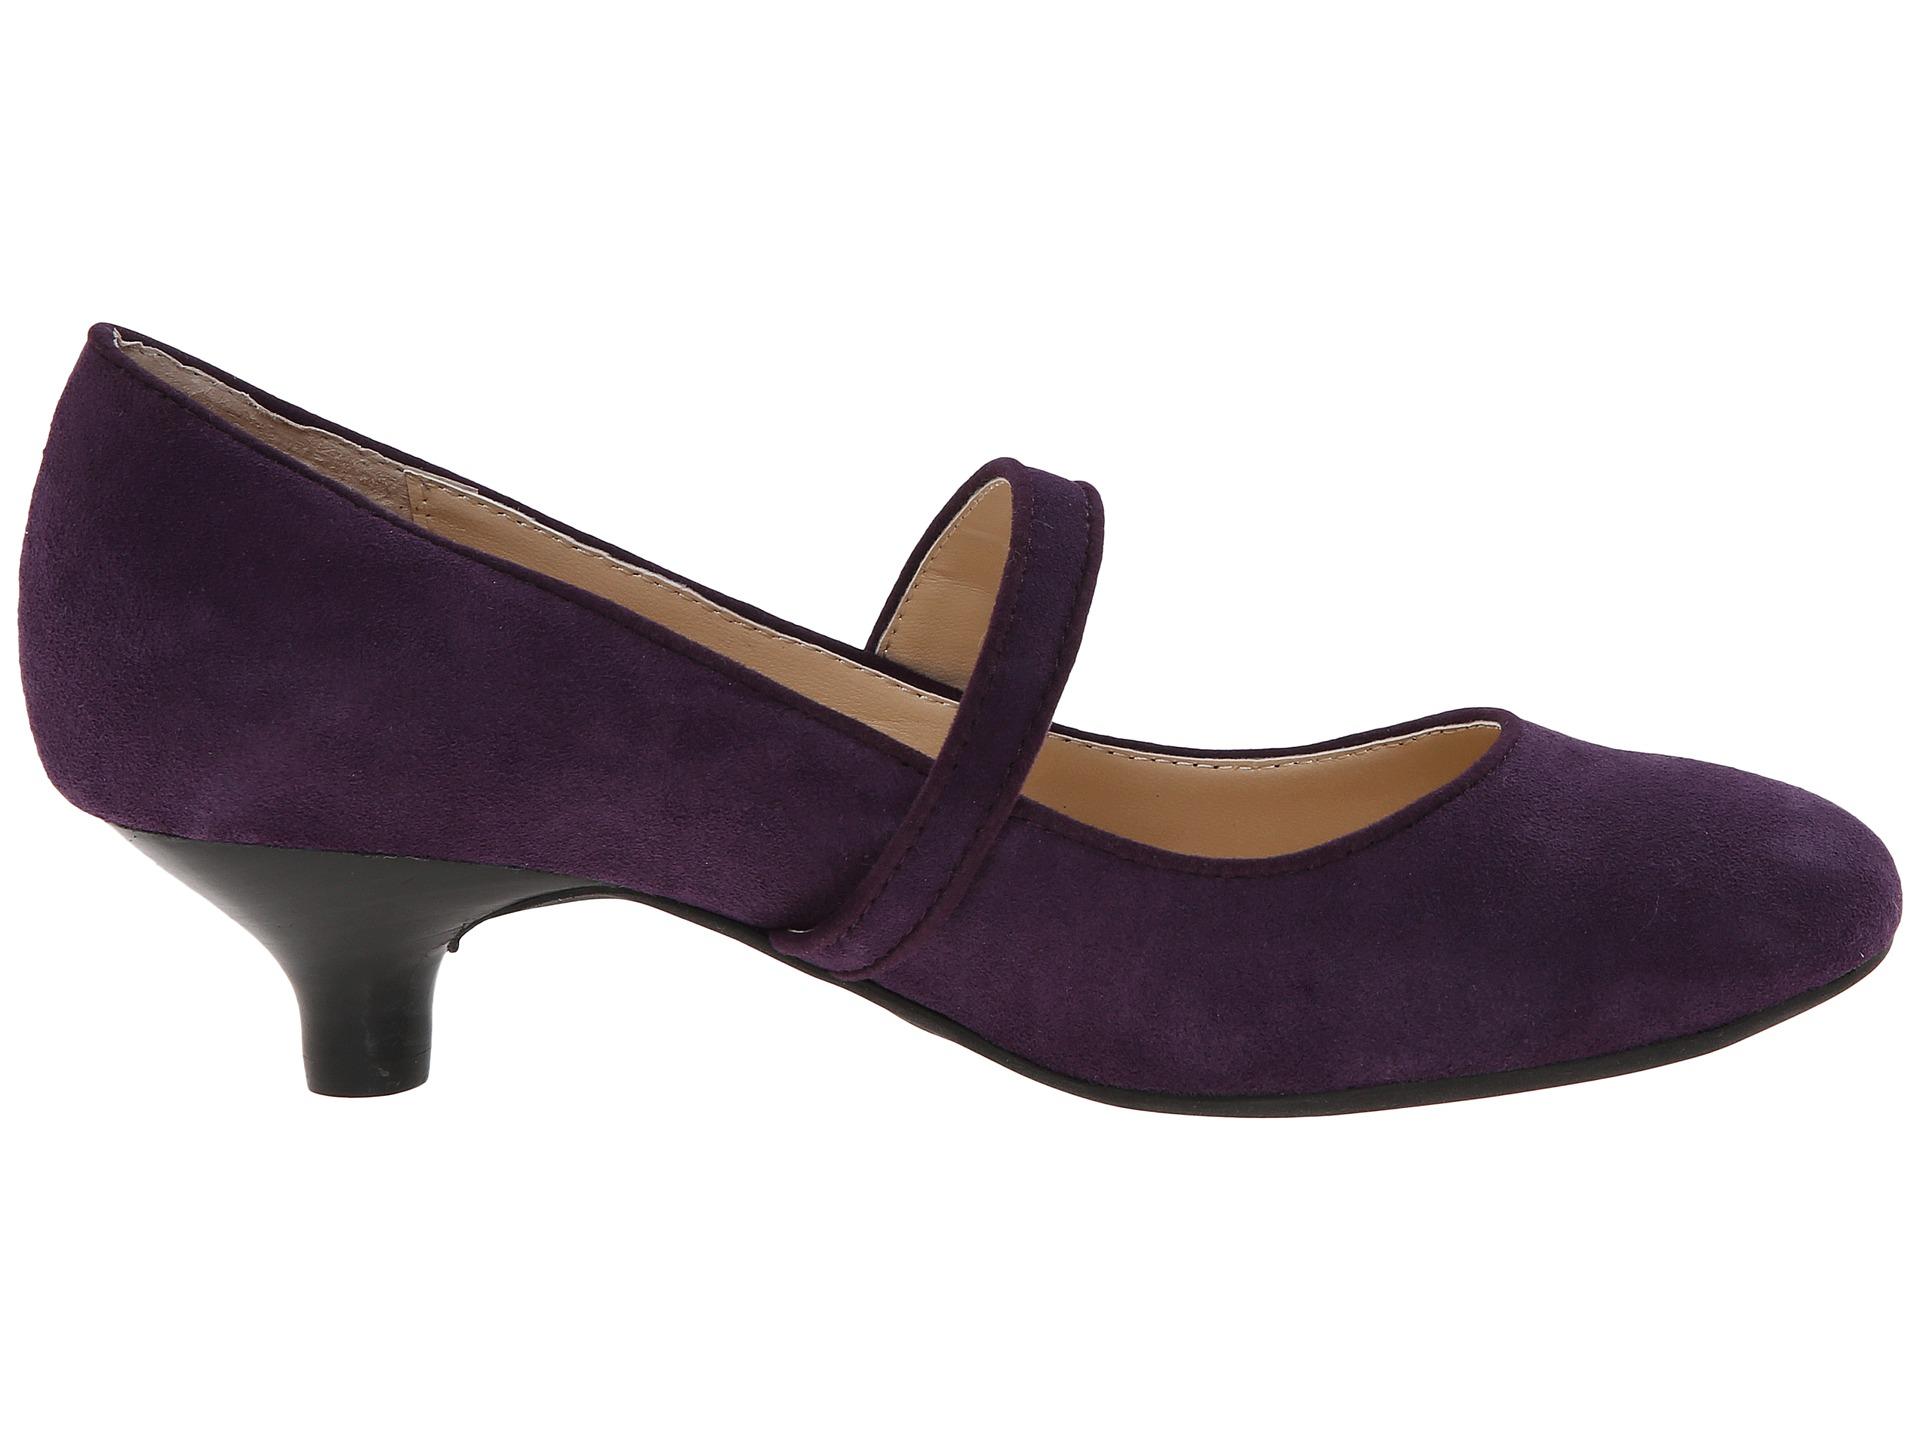 Gabriella Rocha Shoe Size Chart